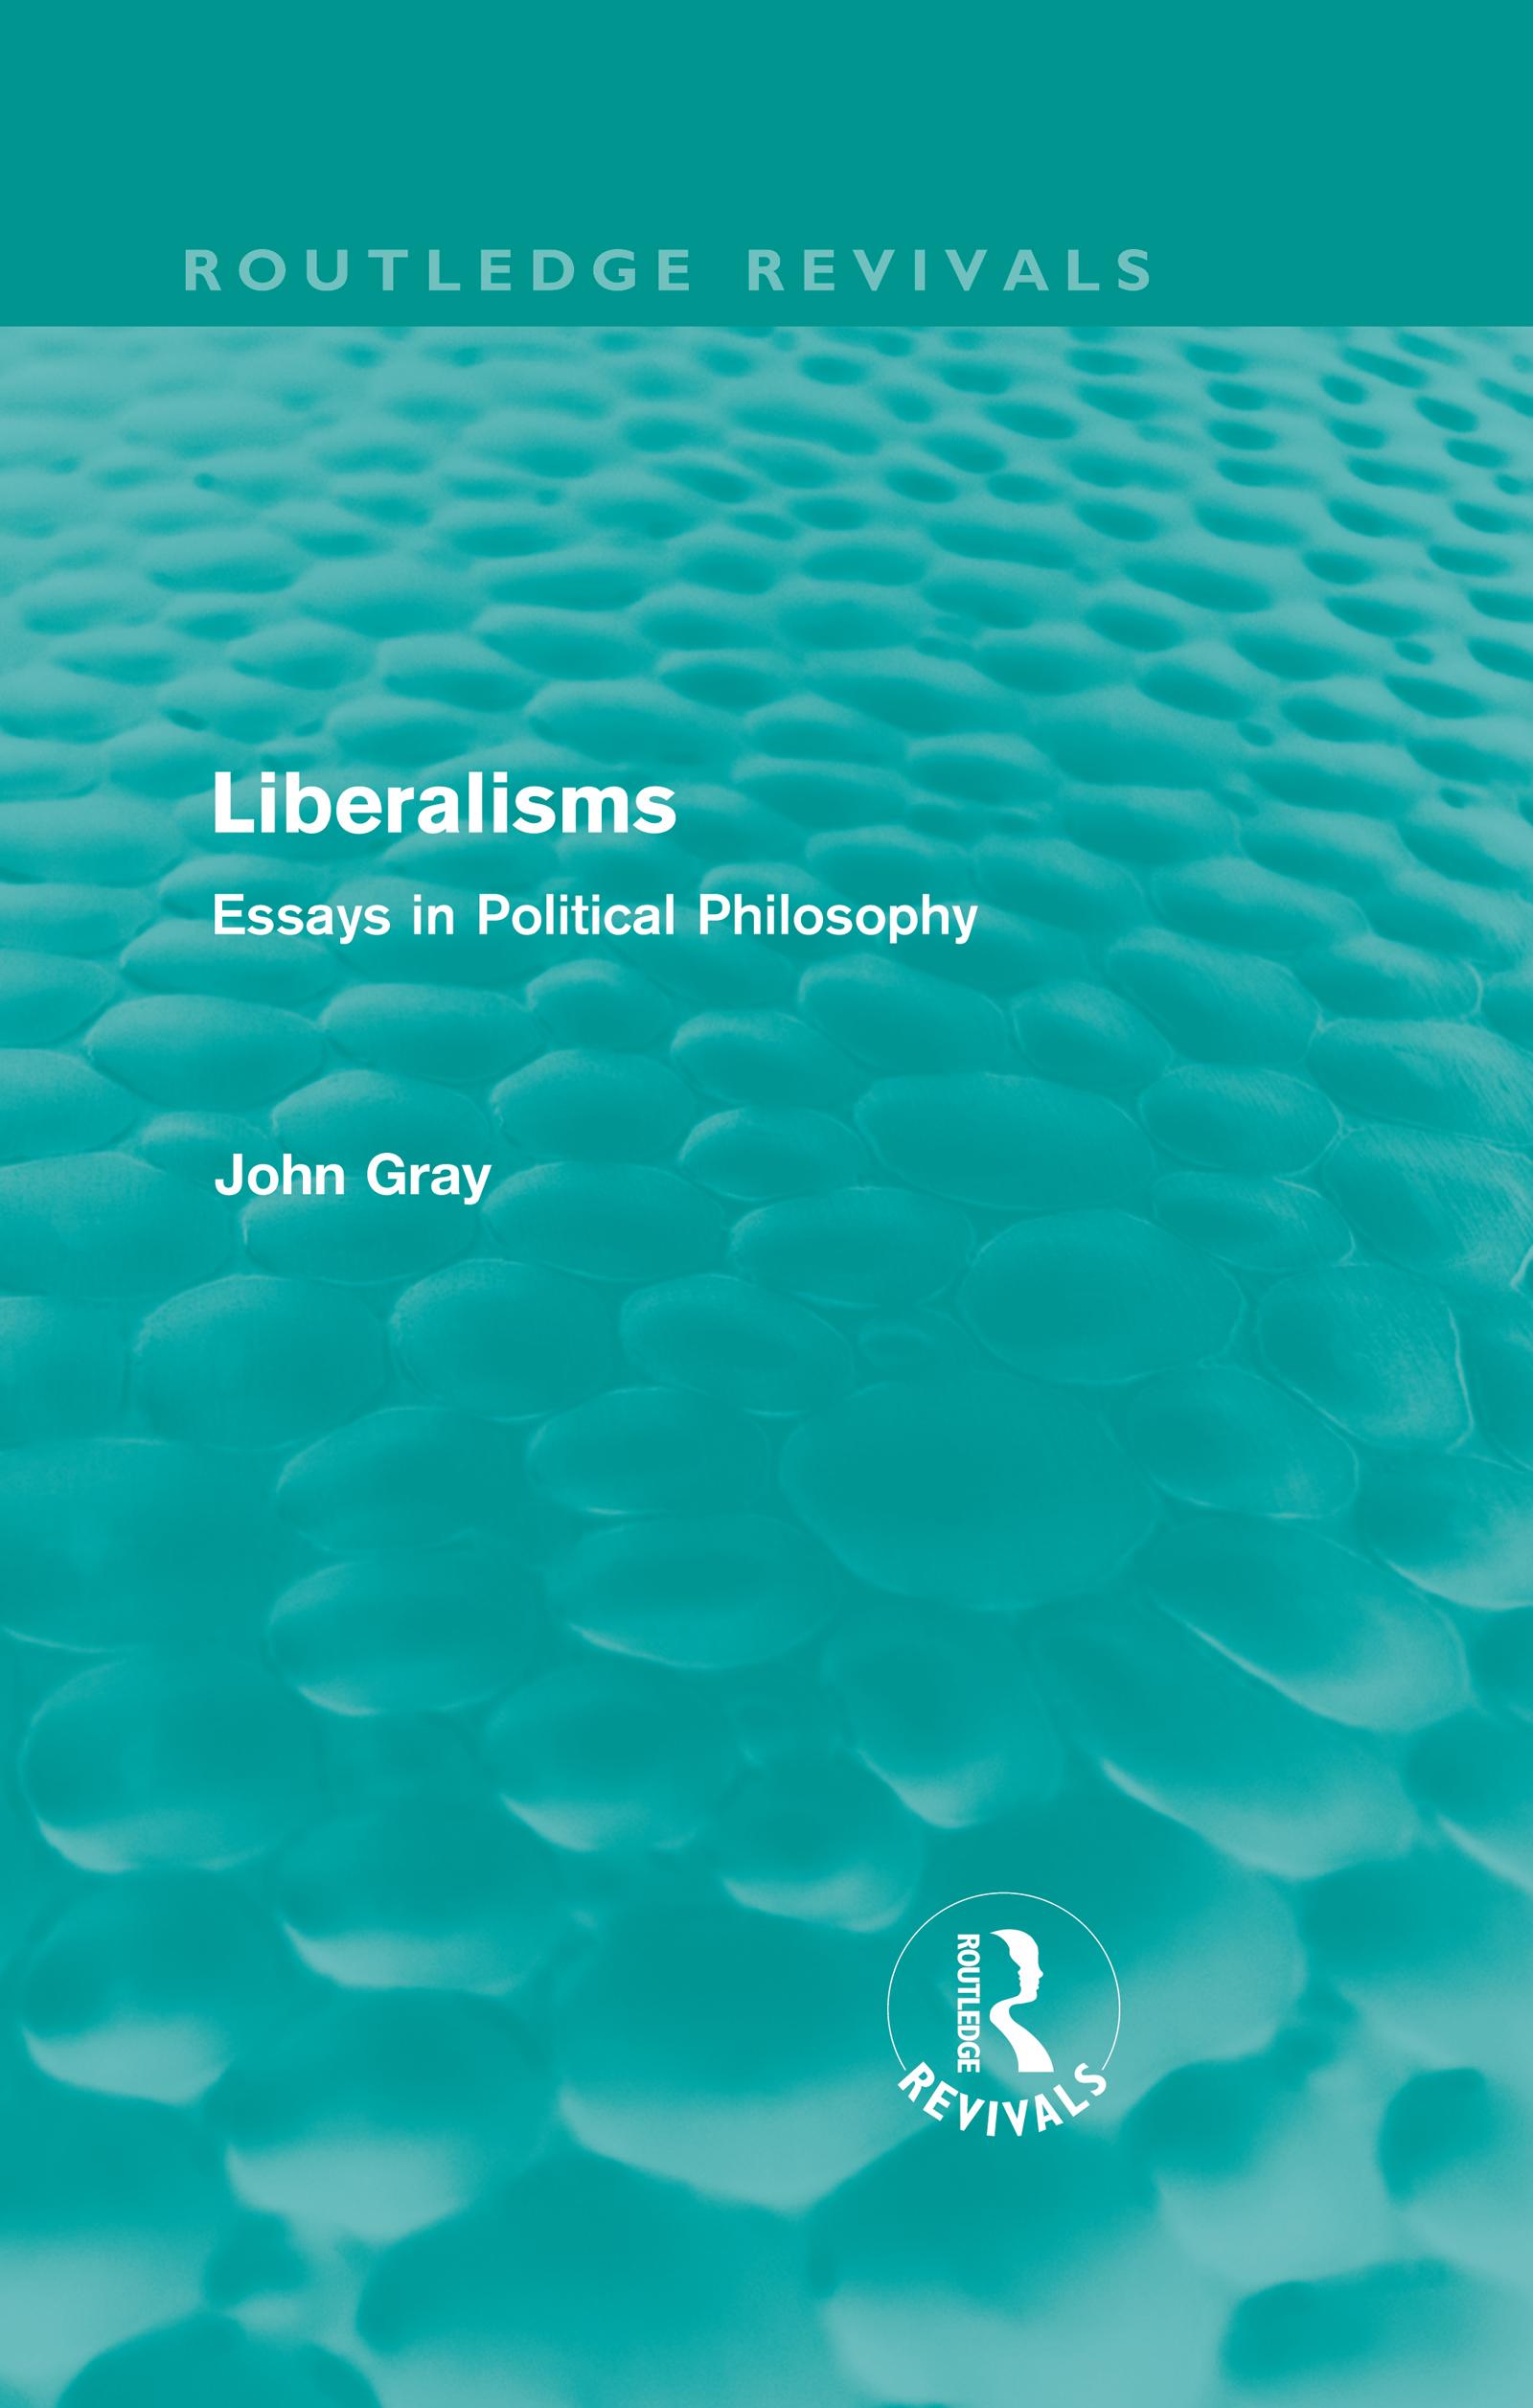 Liberalisms (Routledge Revivals)